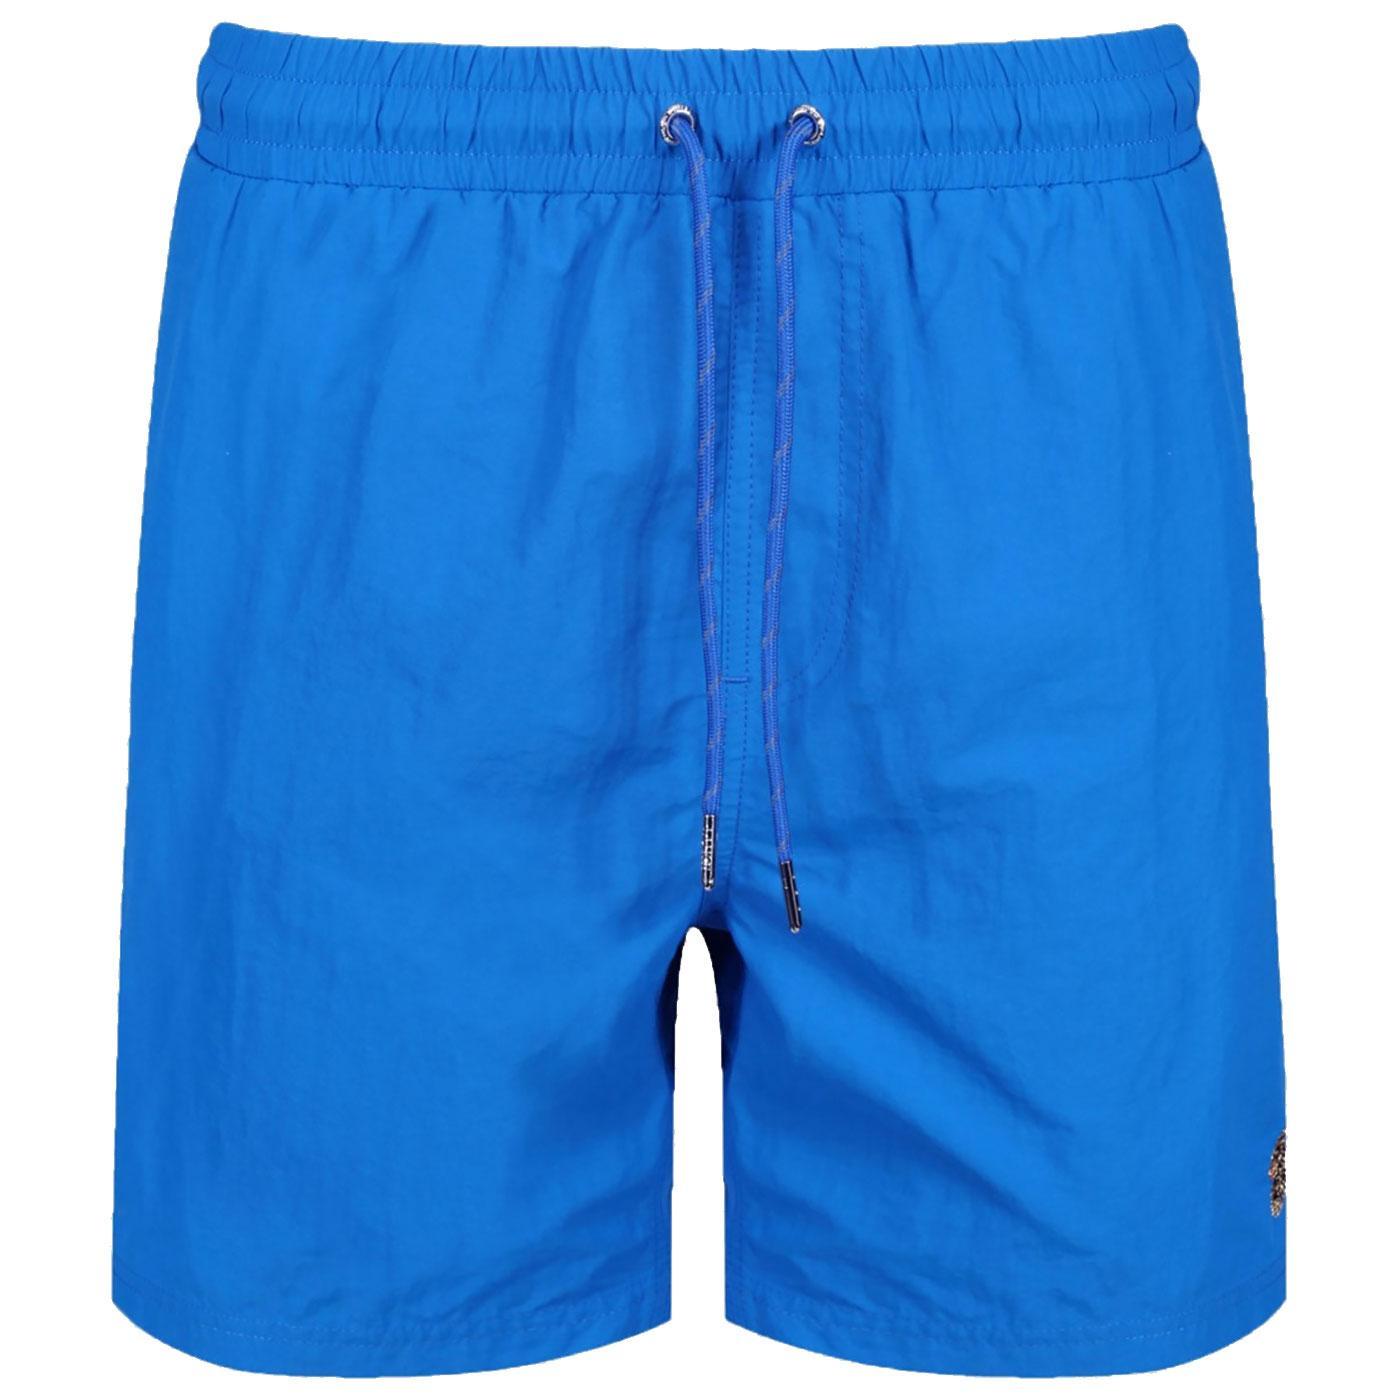 Great LUKE SPORT Mens Retro Swim Shorts BB